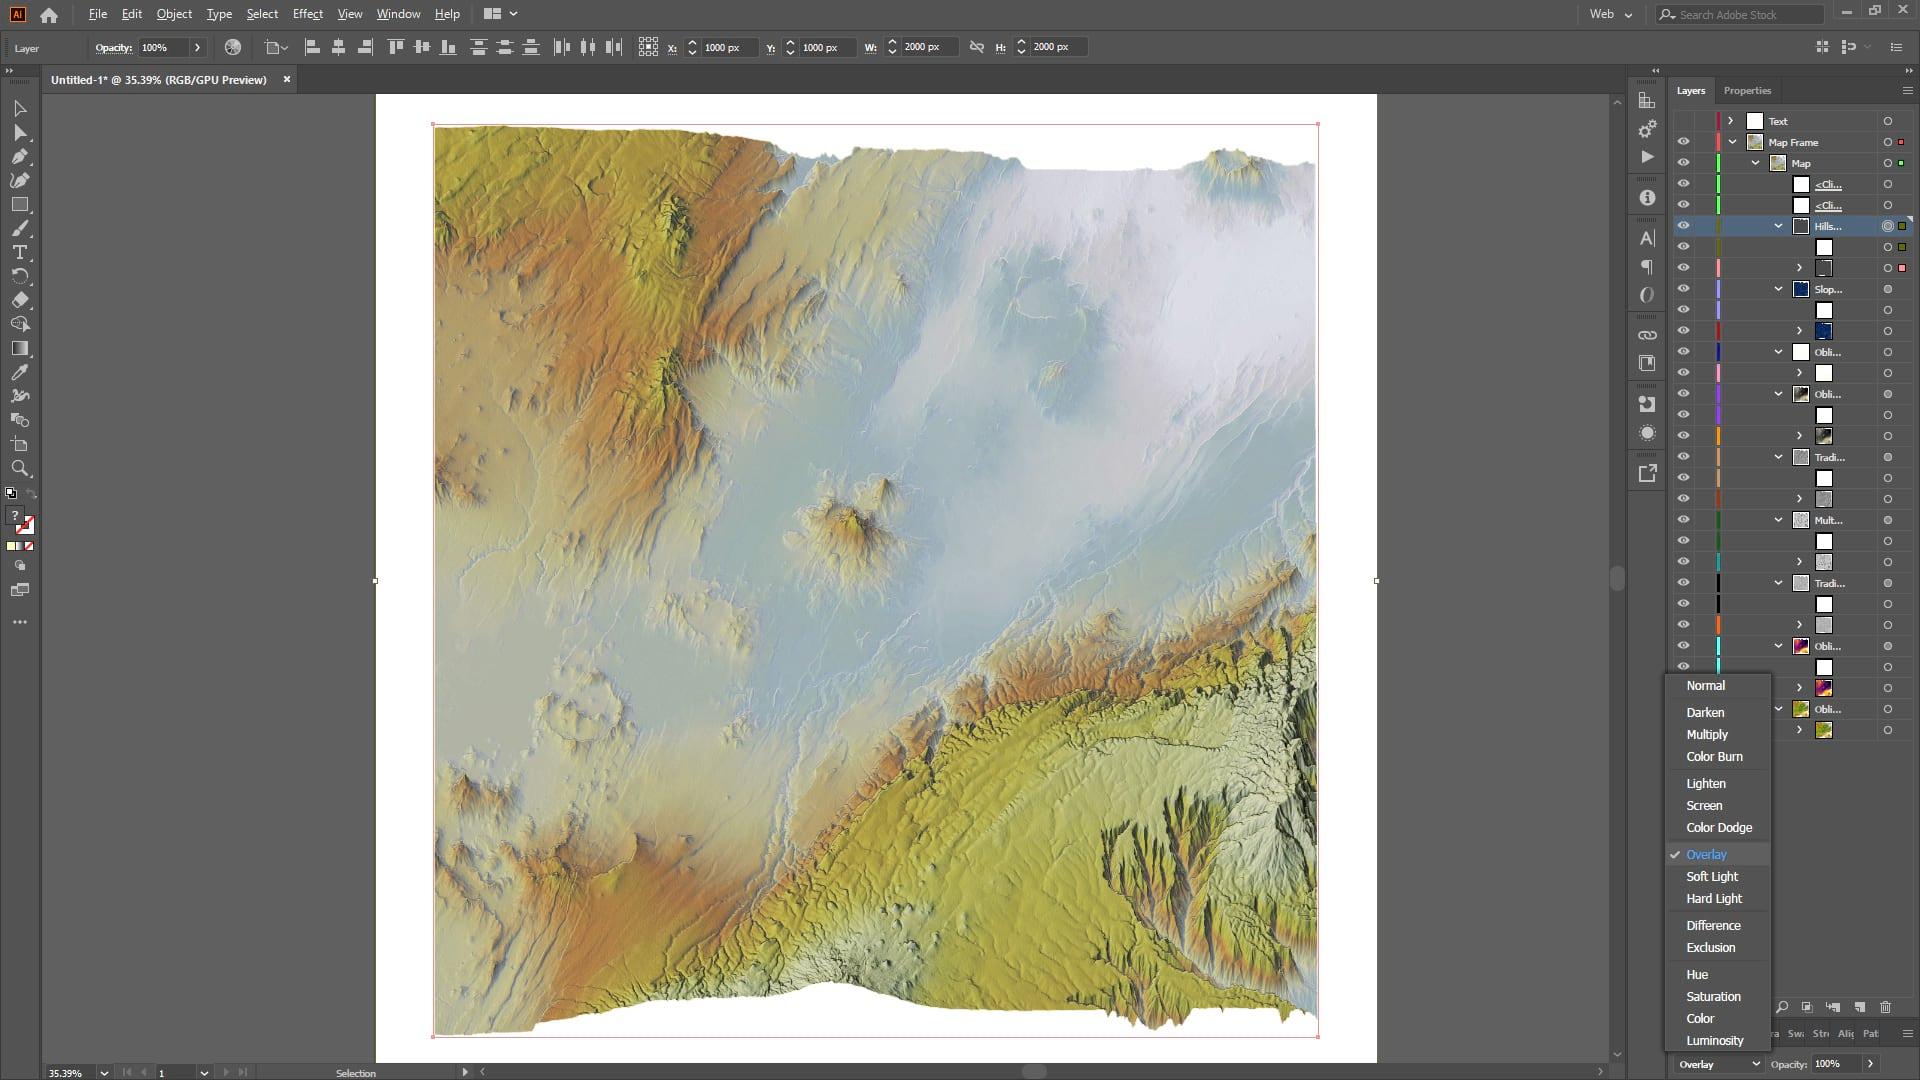 Plan Oblique terrain map in Illustrator.